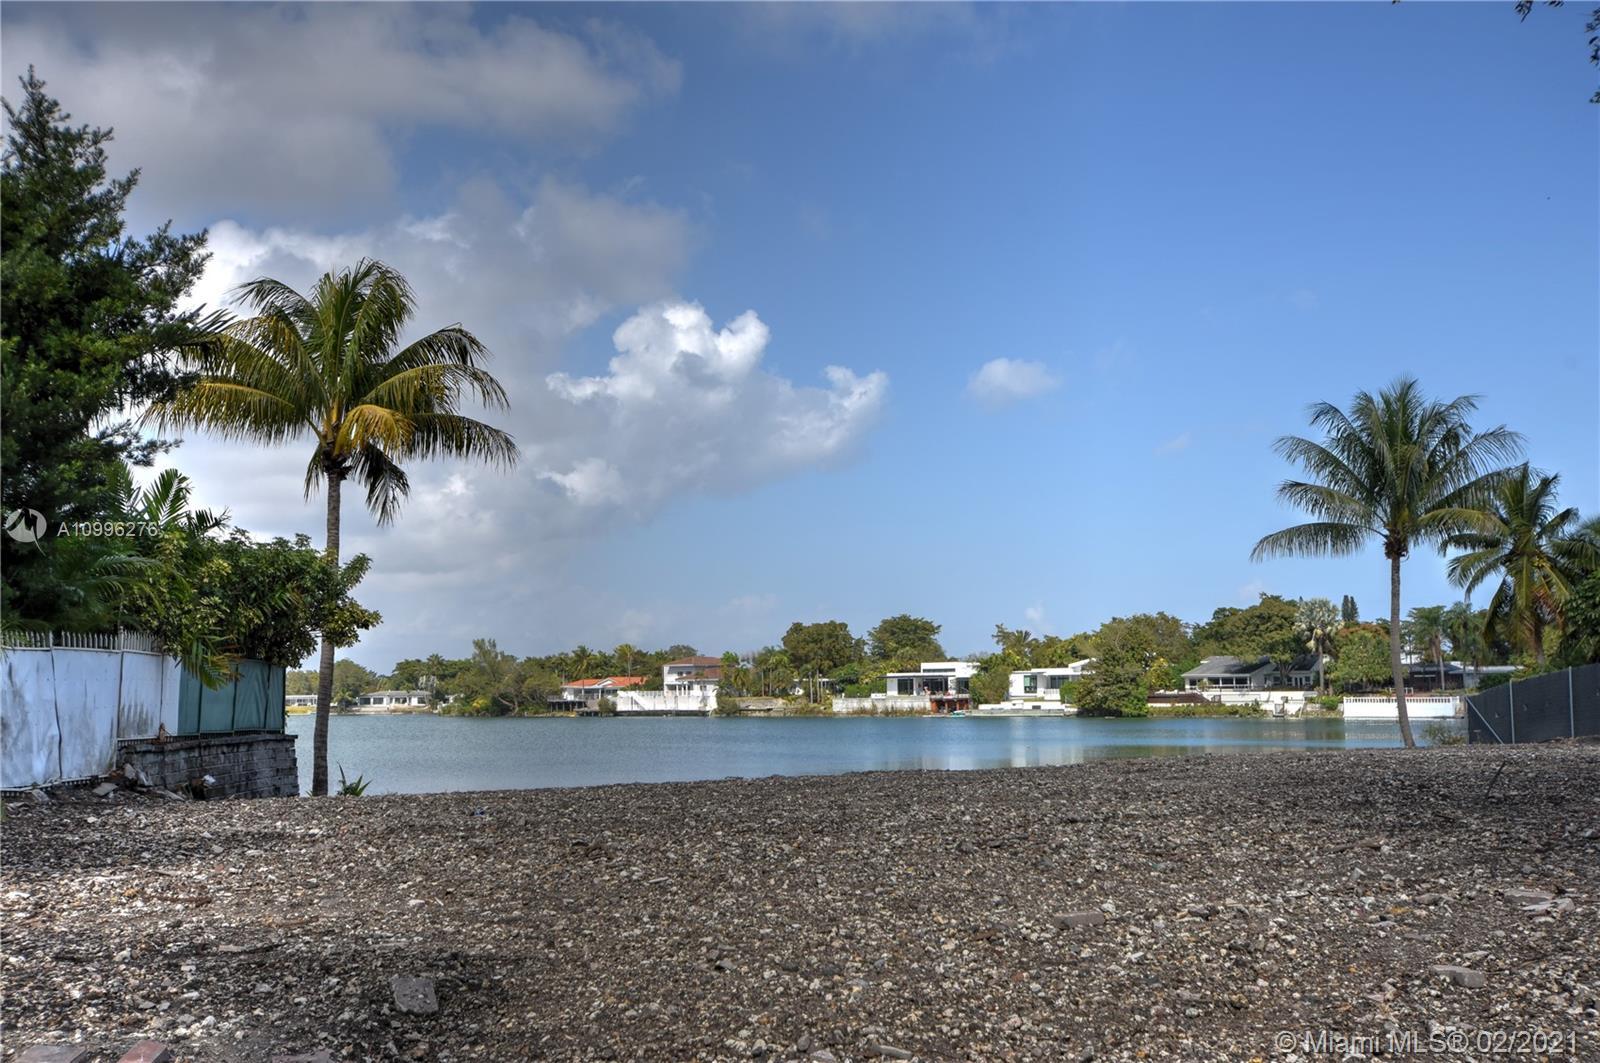 Sky Lake, 2110 NE 191st Dr, North Miami Beach, Florida 33179, image 5